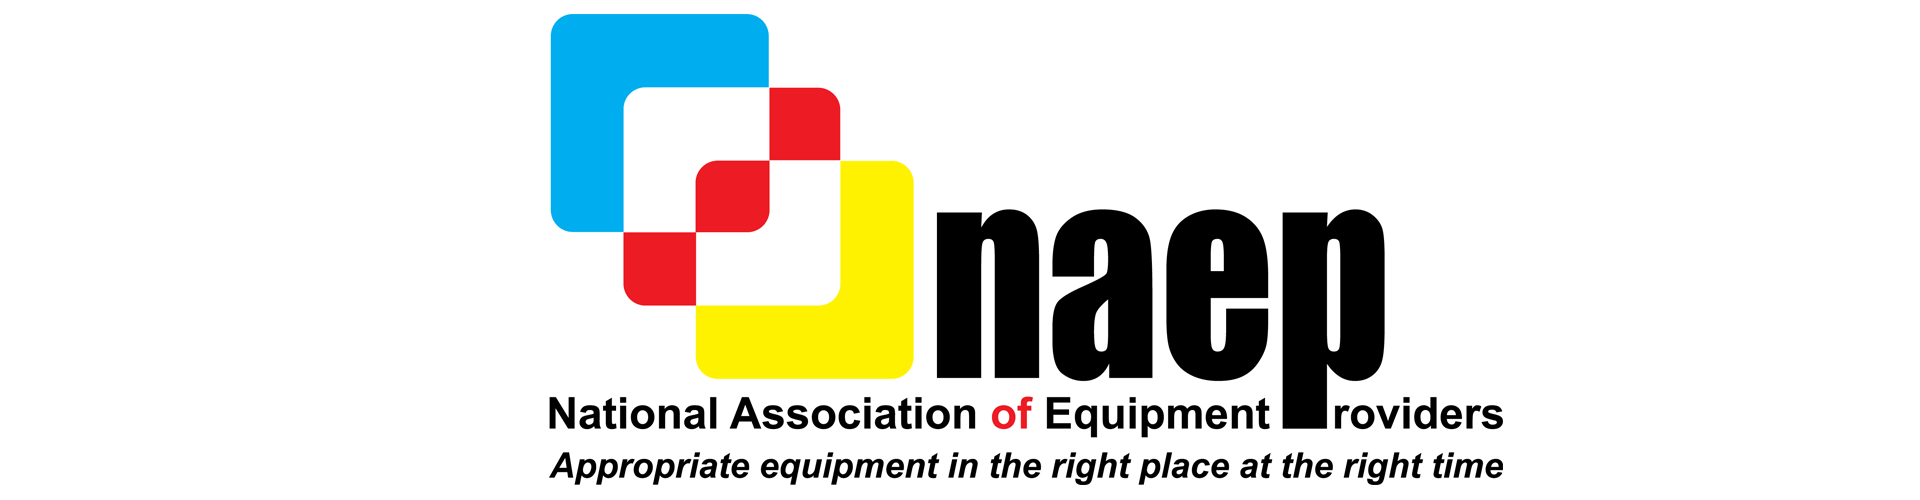 national association of equipment providers logo